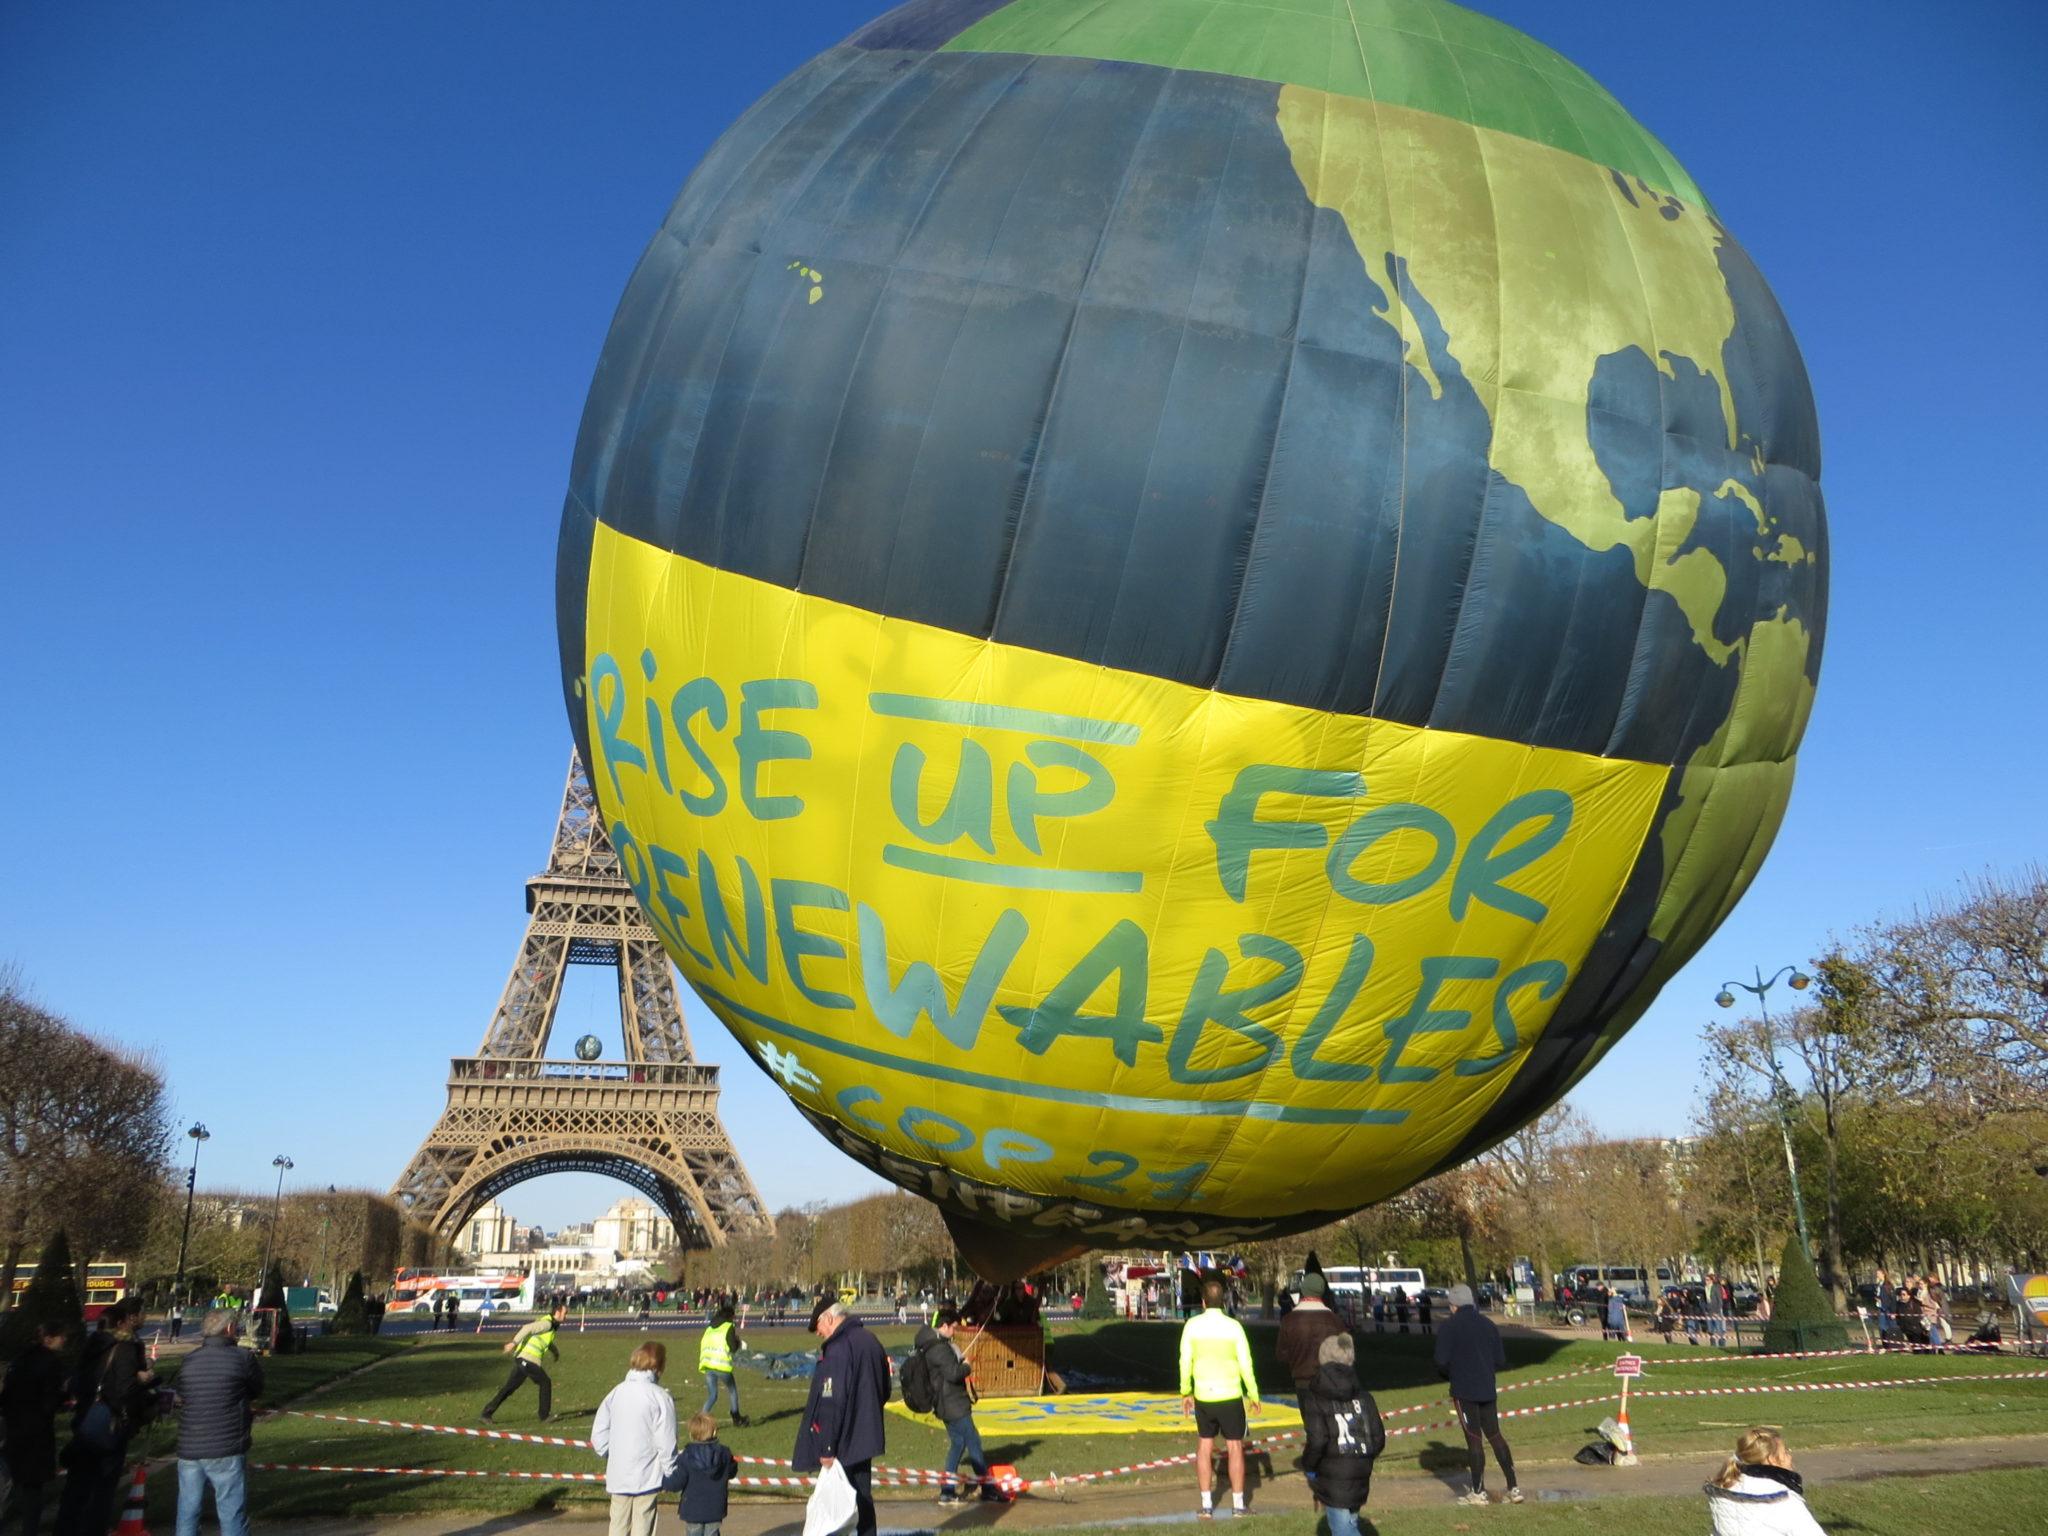 Greenpeace_France_2015_Flickr.jpg